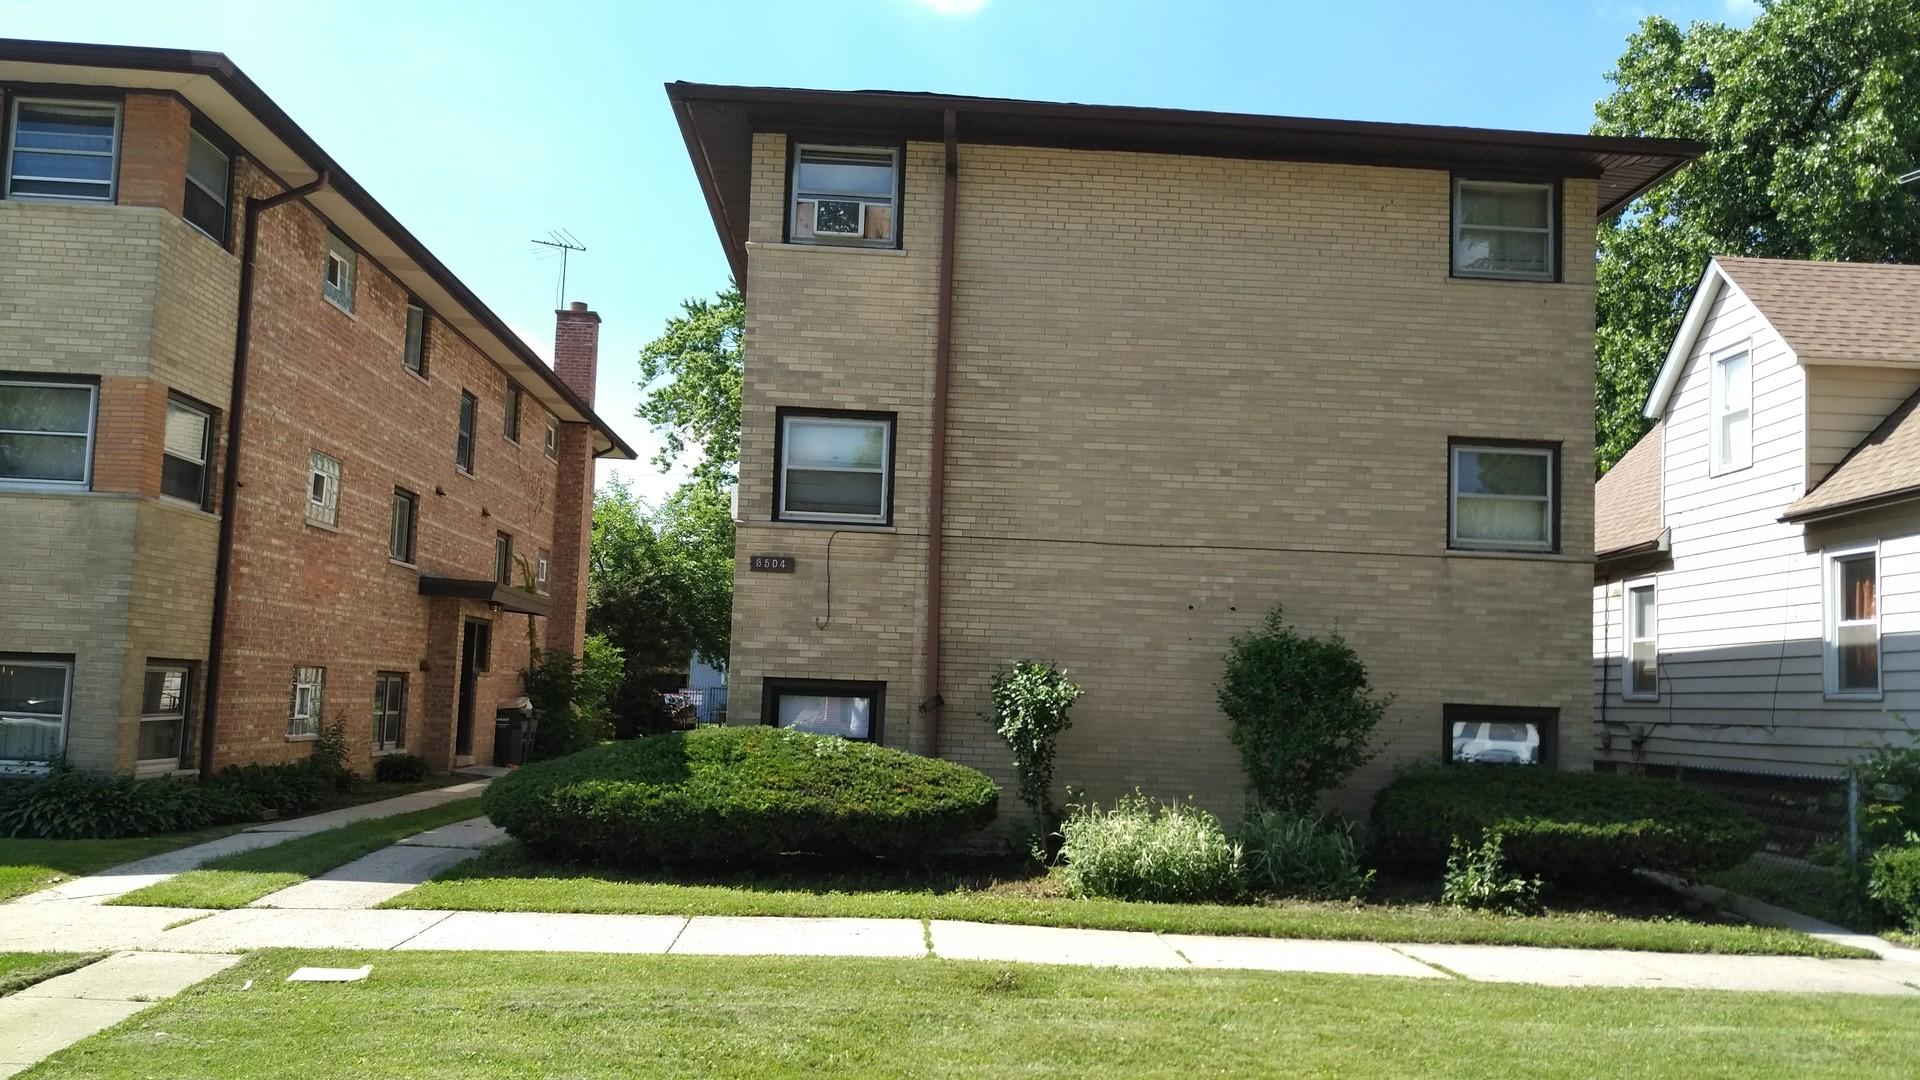 3504 Adams, Bellwood, Illinois 60104